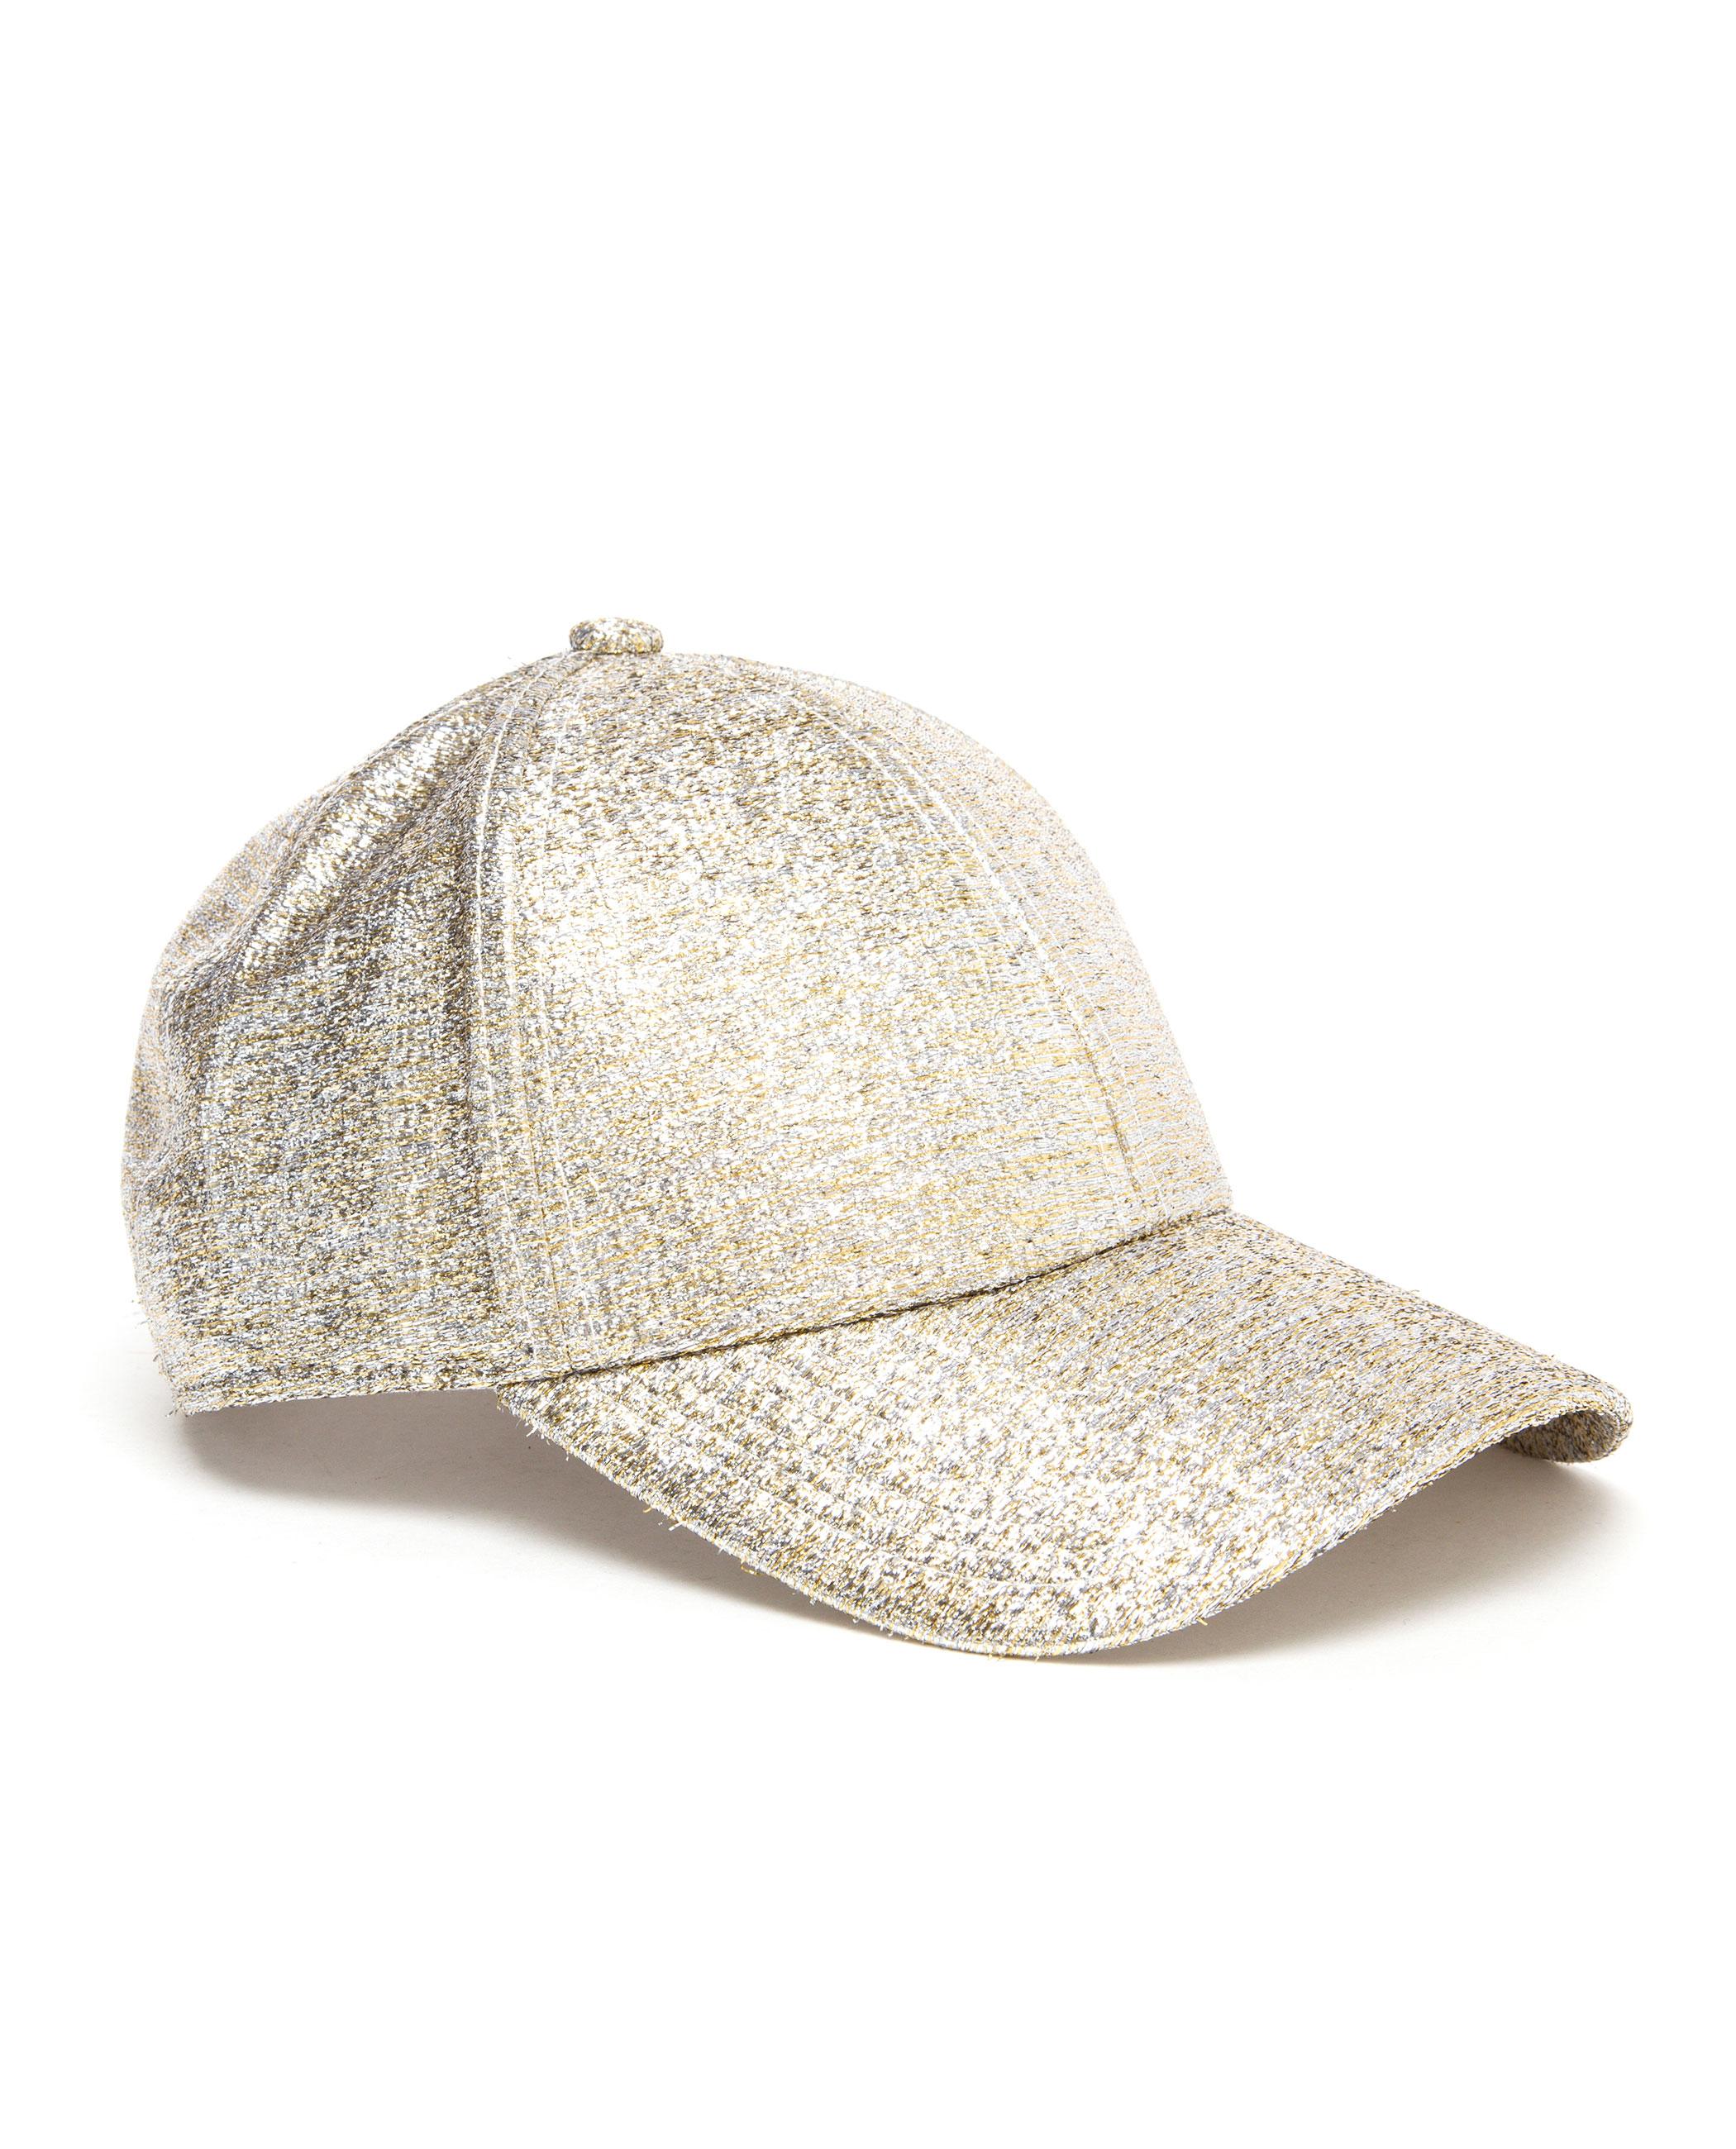 cc06d9640aa Acne Studios Camp Glitter Baseball Cap in Metallic - Lyst